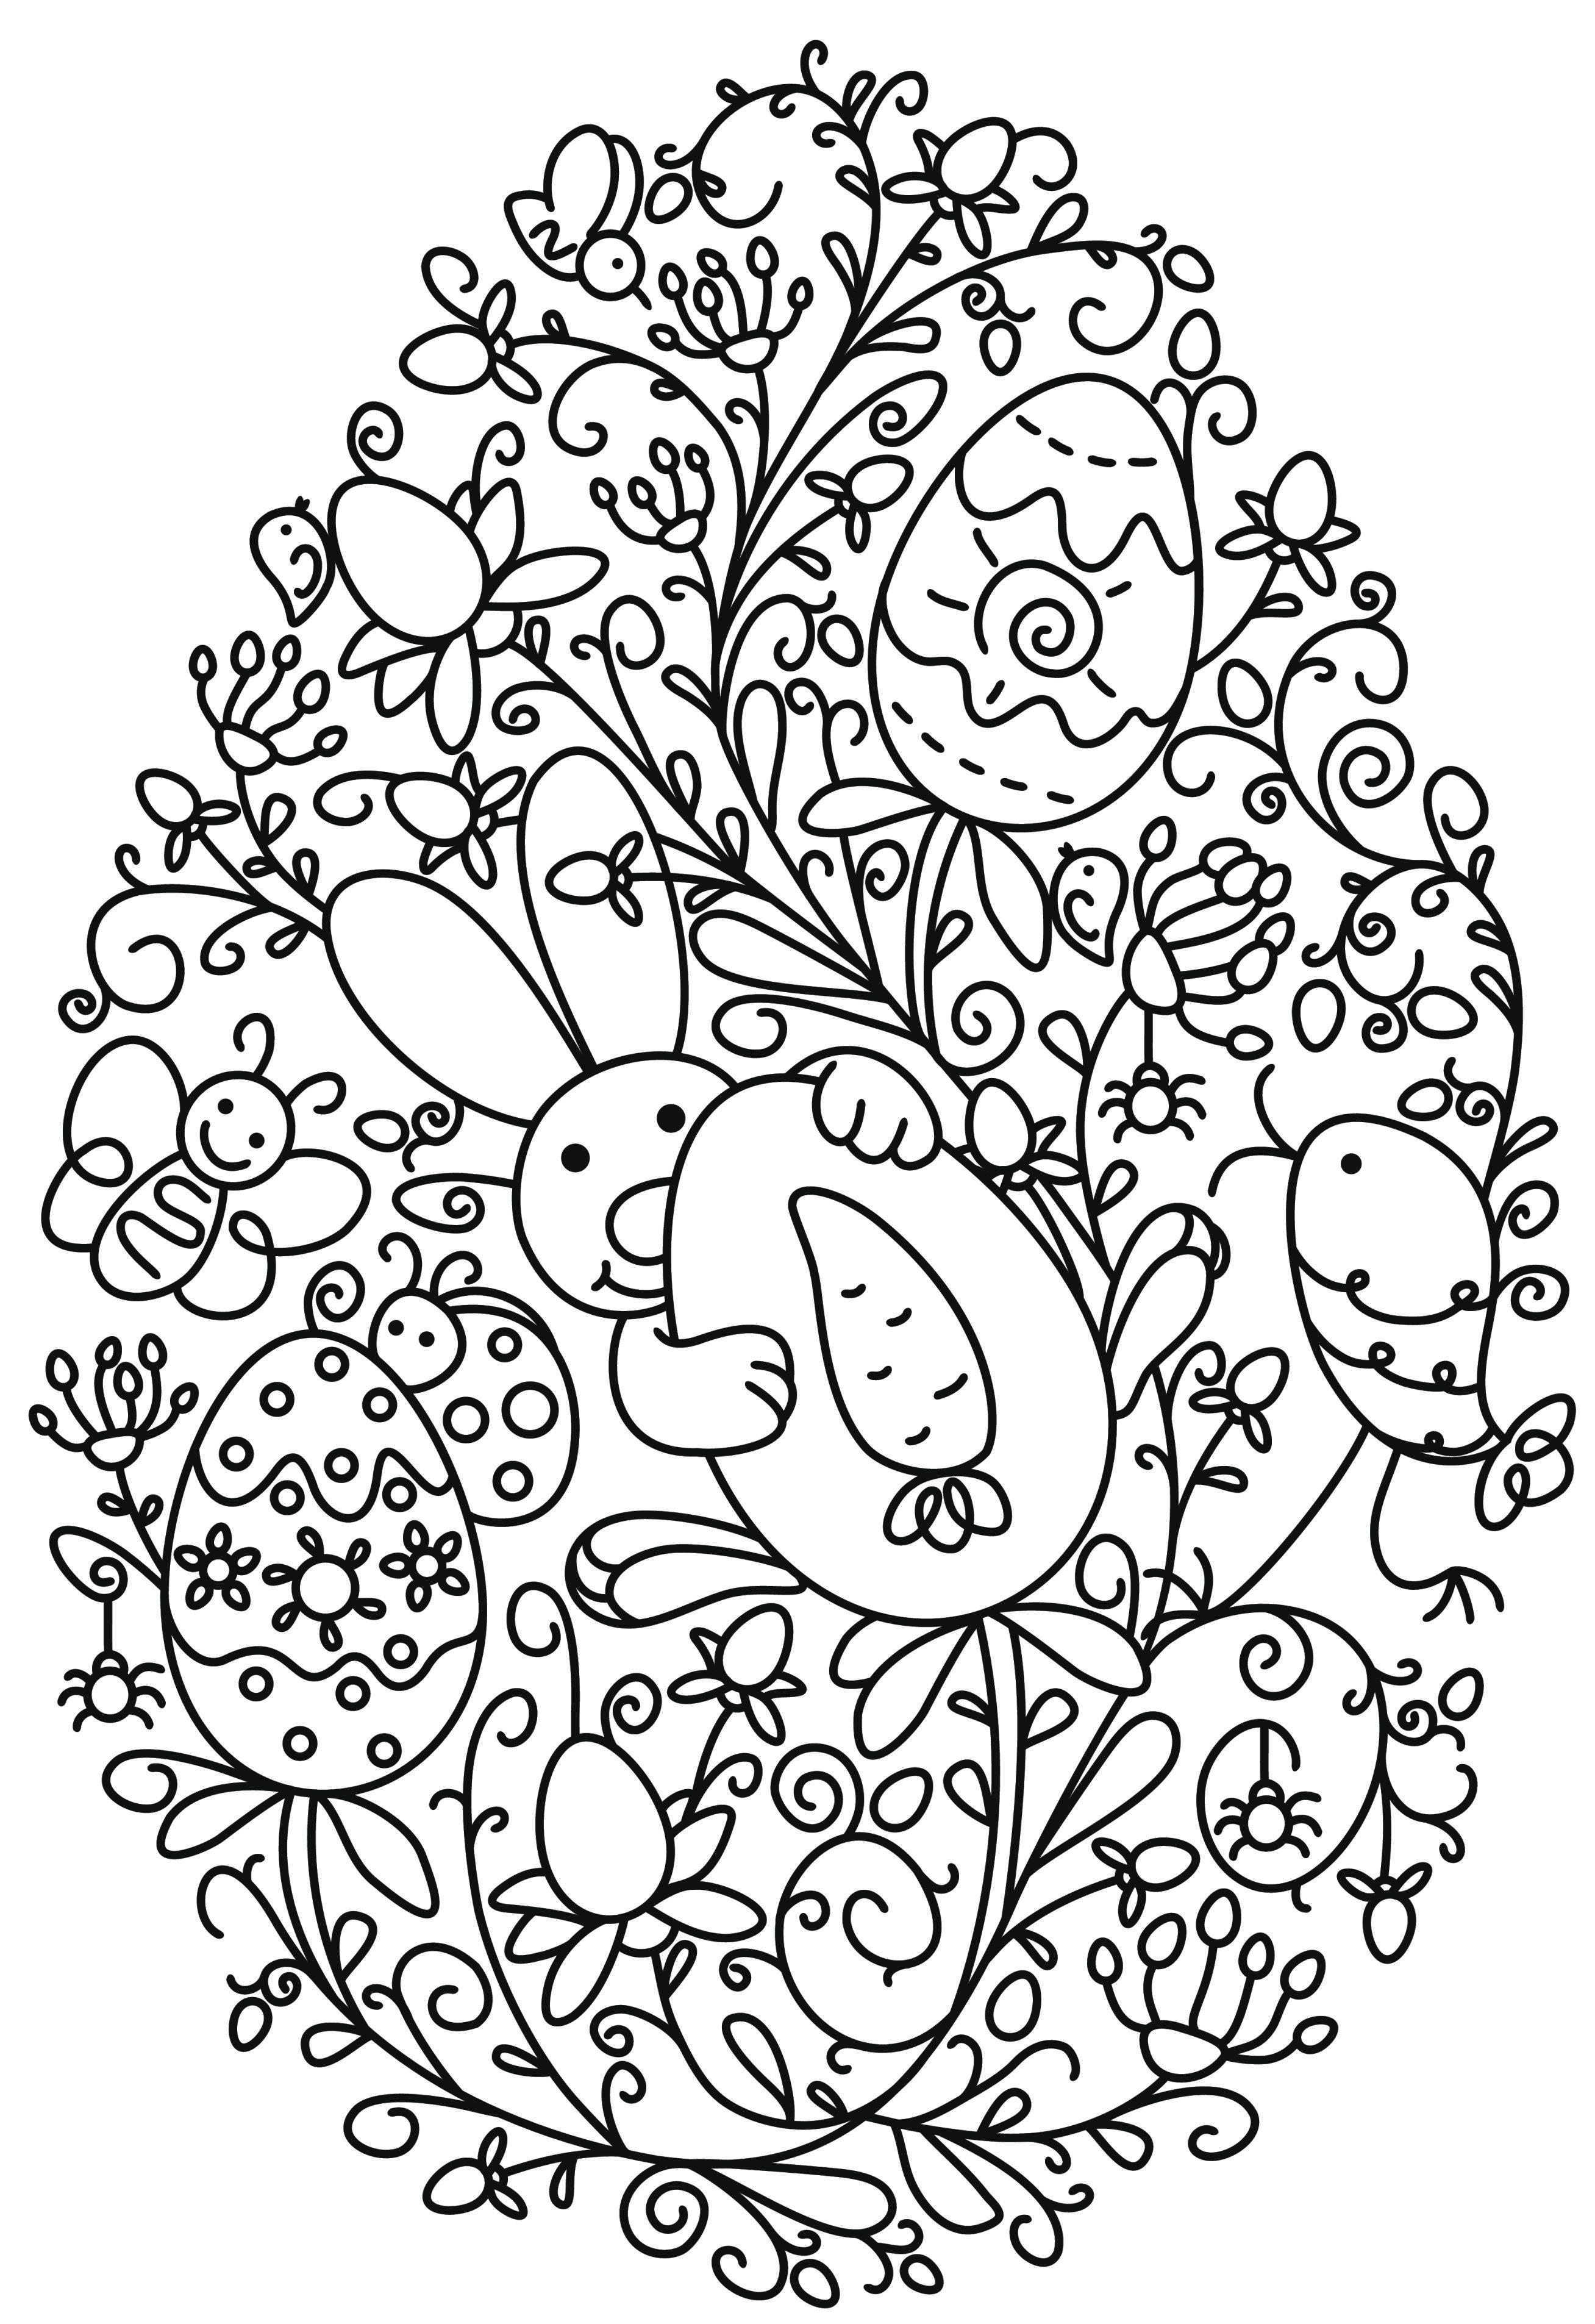 Dibujos-para-colorear-de-semana-santa-1.jpg (2616×3811) | DIY Pâques ...